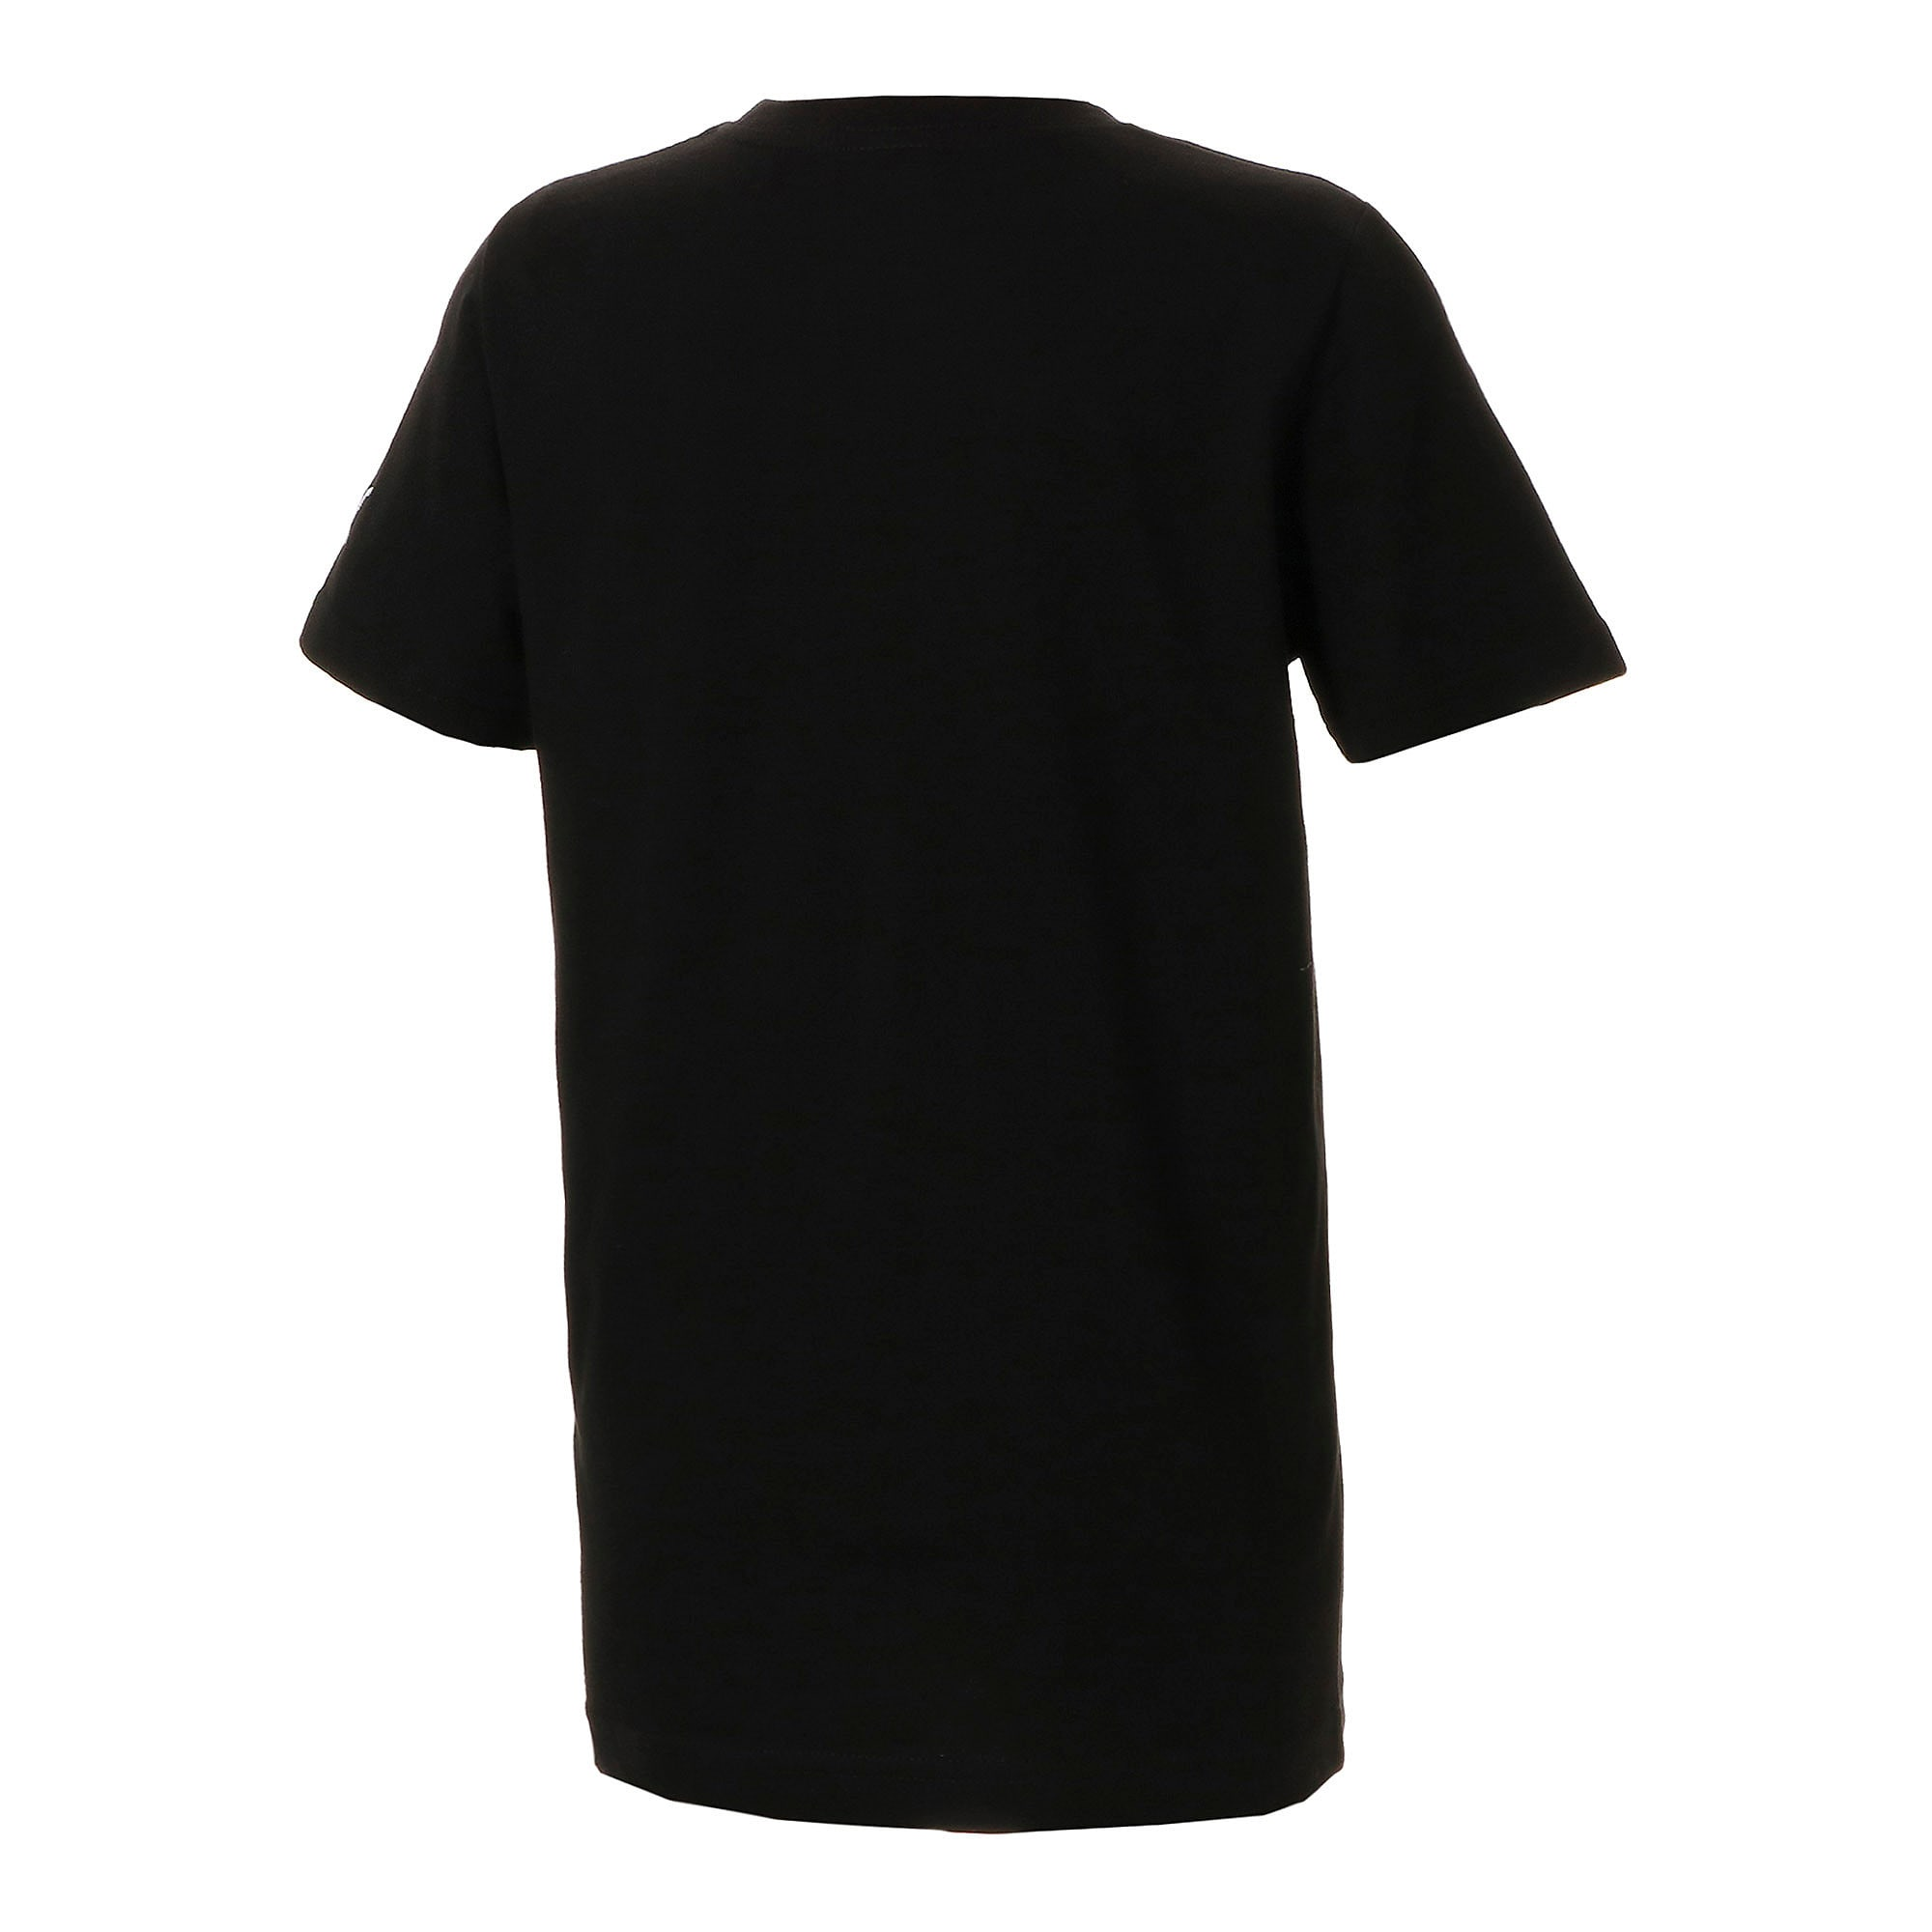 Thumbnail 3 of キッズ シティー 半袖 Tシャツ 2 OSAKA 大阪, Puma Black, medium-JPN